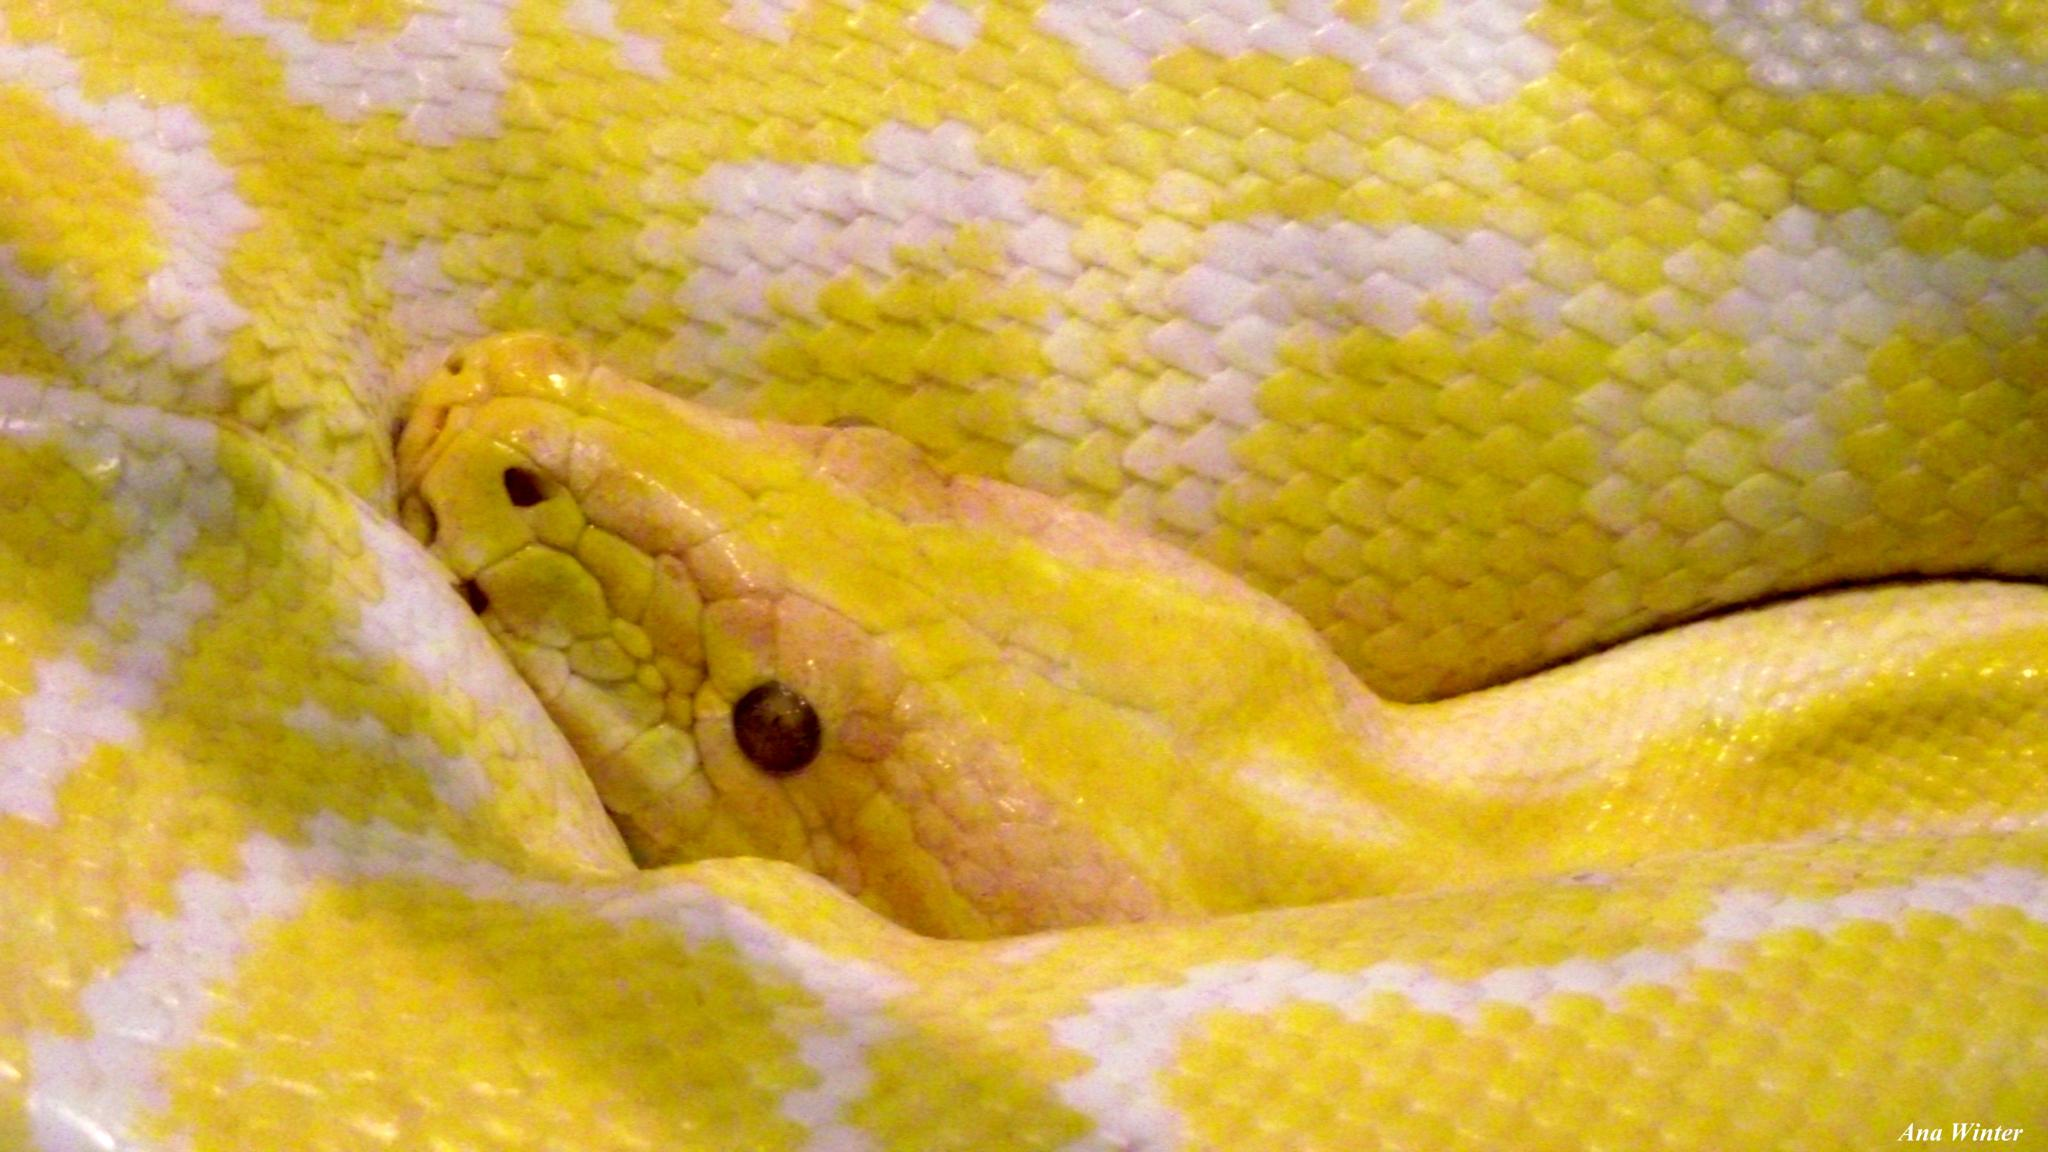 Burmese Python by Ana Winter